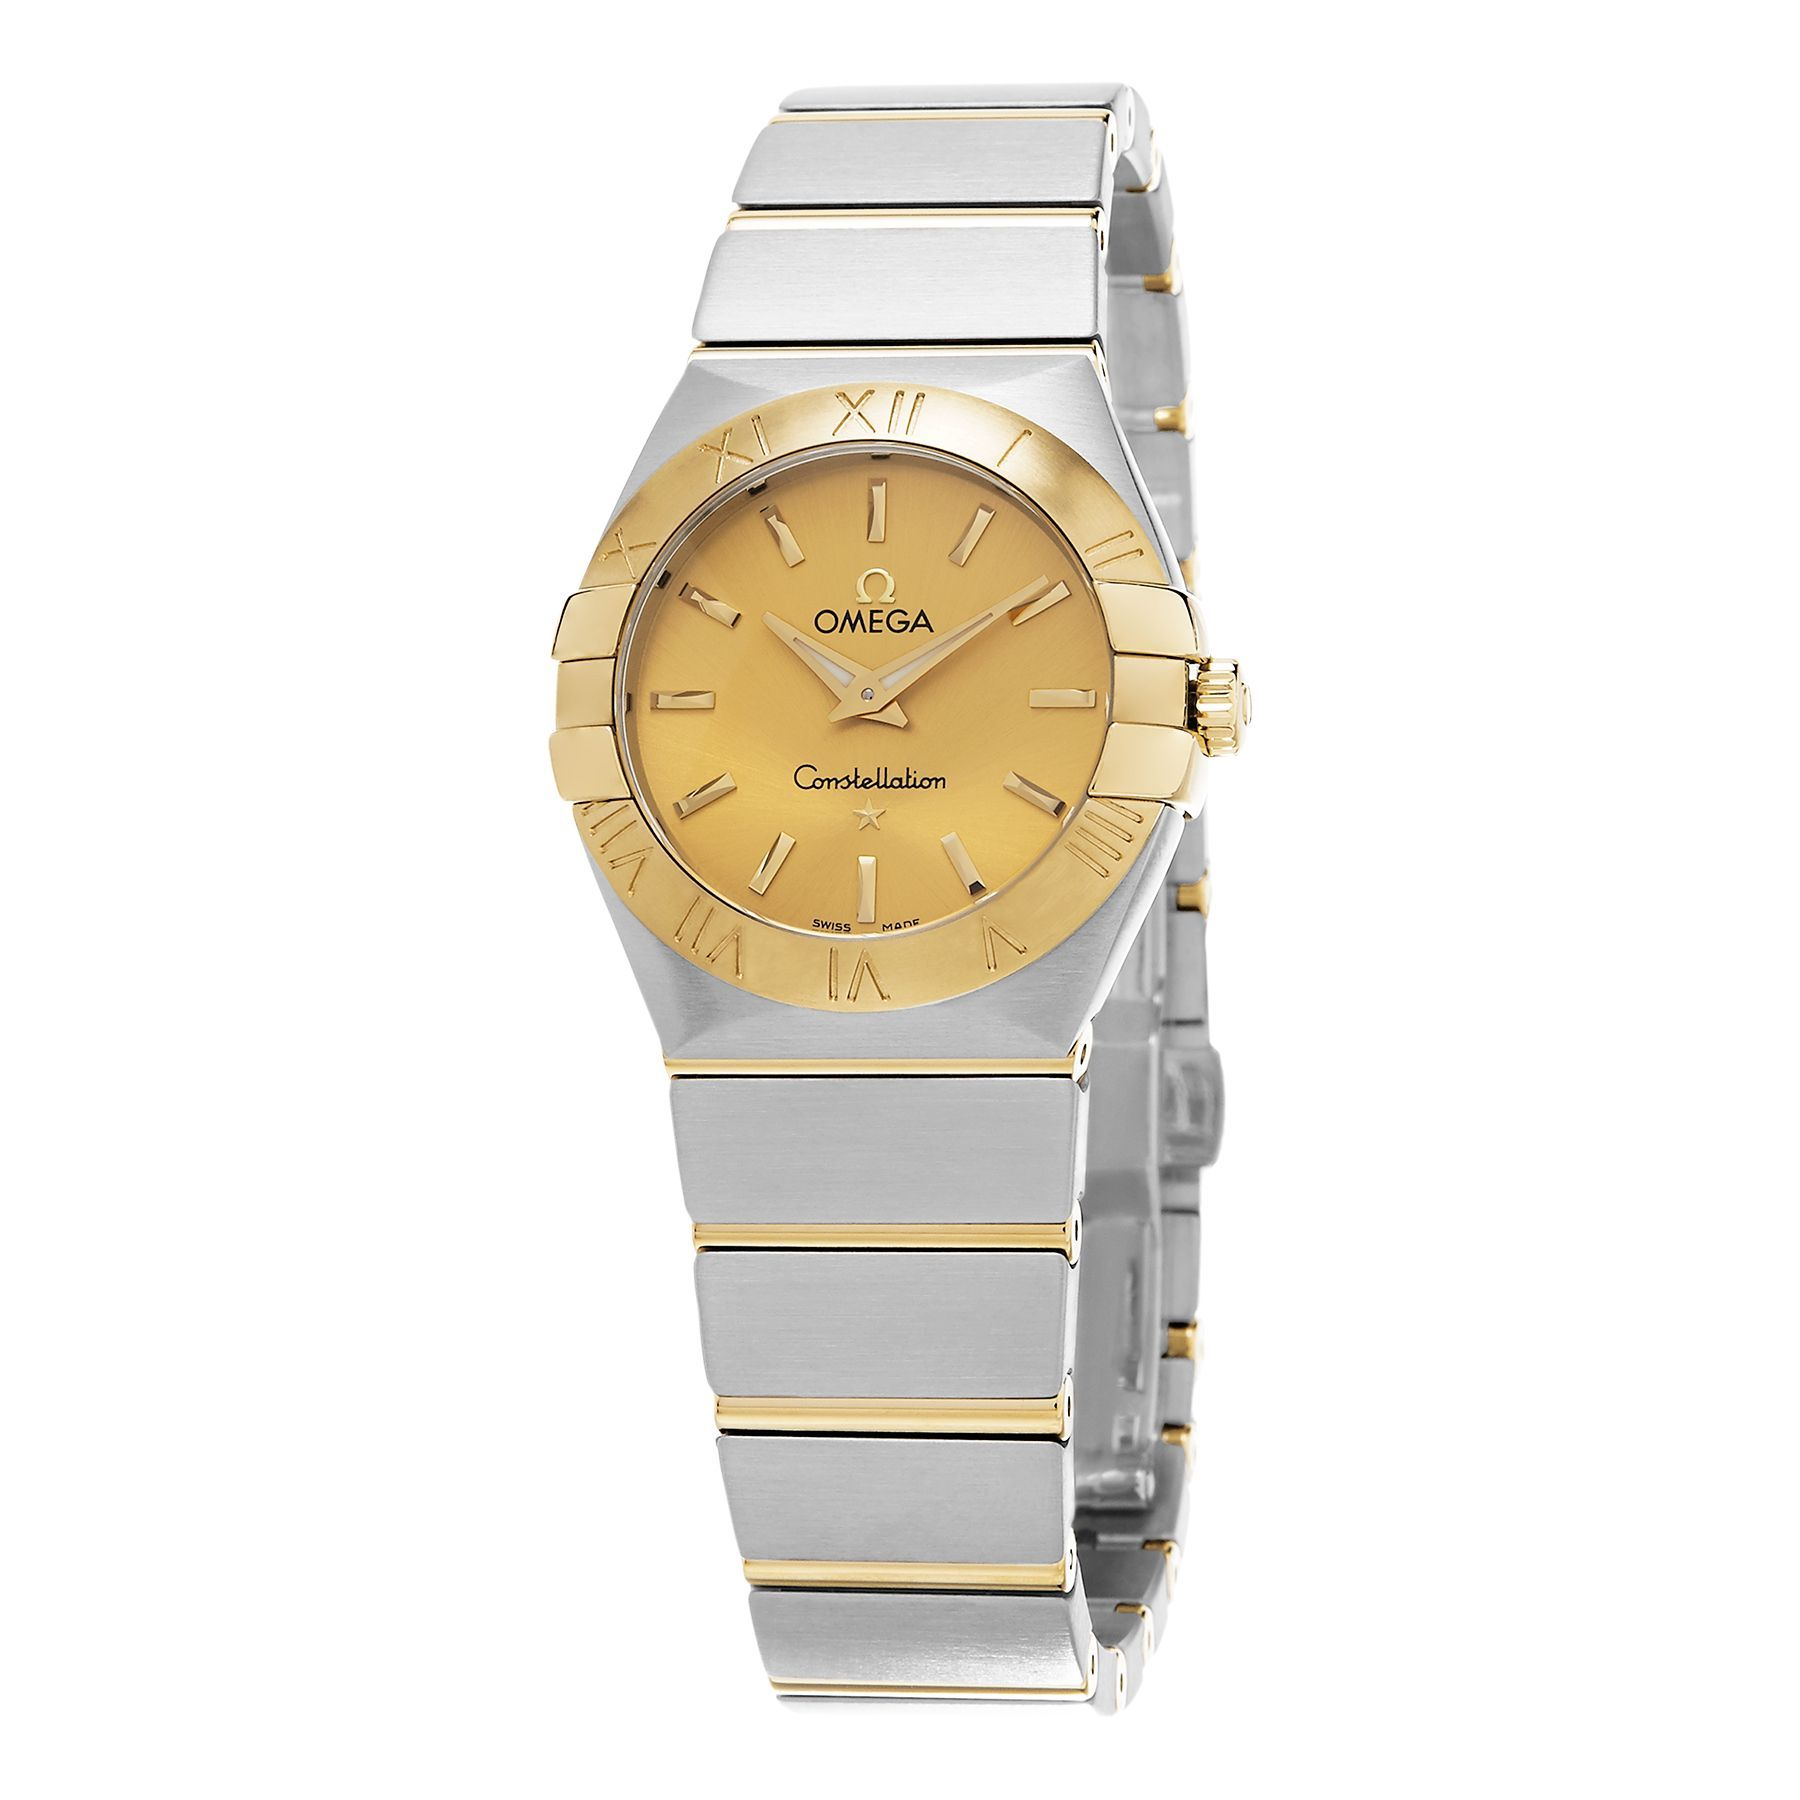 Omega Women's 123.20.27.60.08.001 'Constellation' tone Dial Stainless Steel/Yellow Swiss Quartz Watch